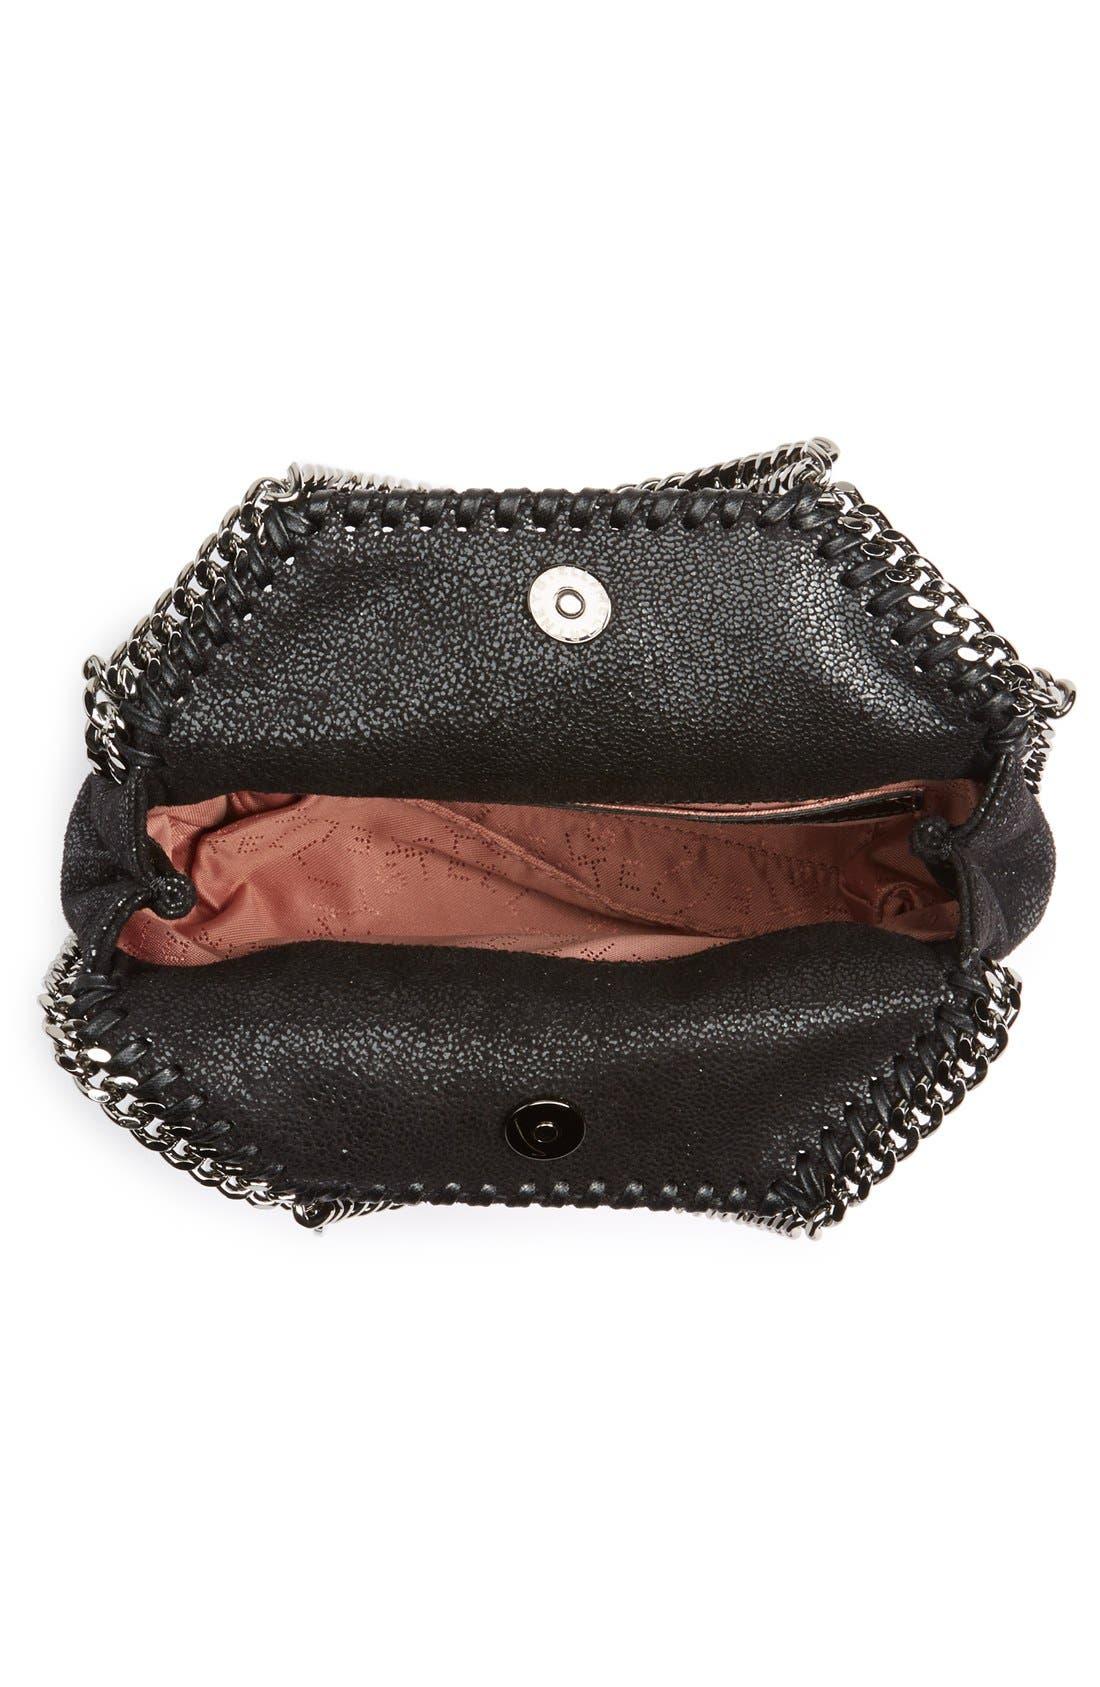 'Tiny Falabella' Faux Leather Crossbody Bag,                             Alternate thumbnail 4, color,                             Black